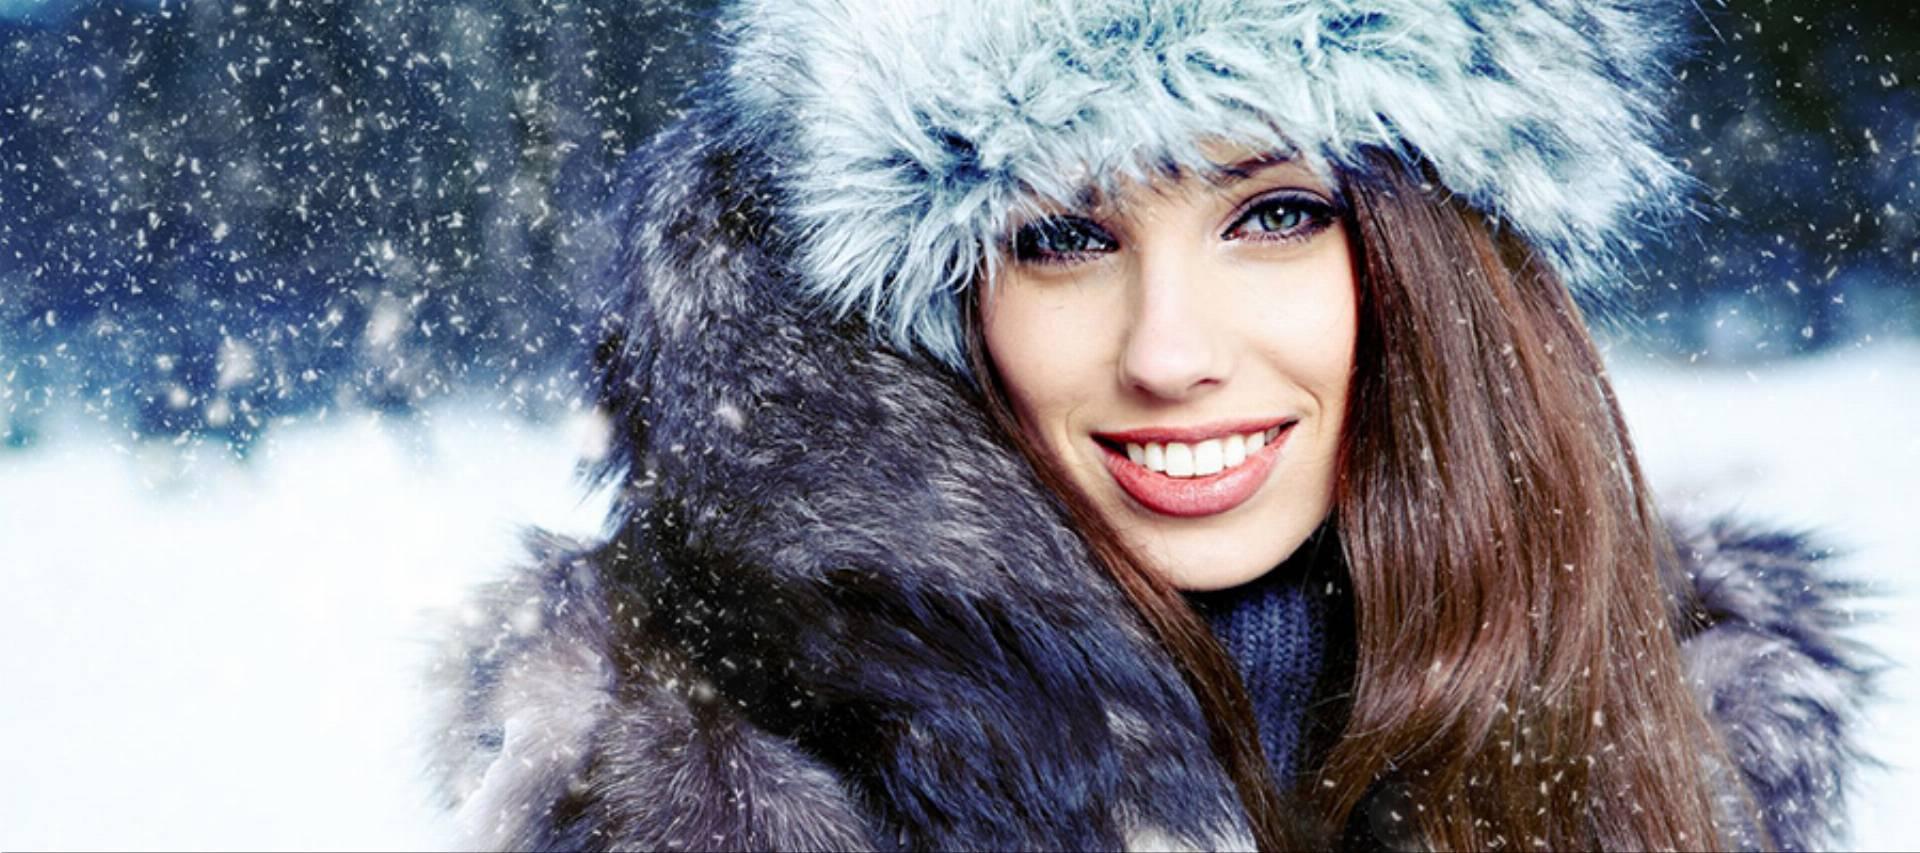 12351054 - winter woman on snow